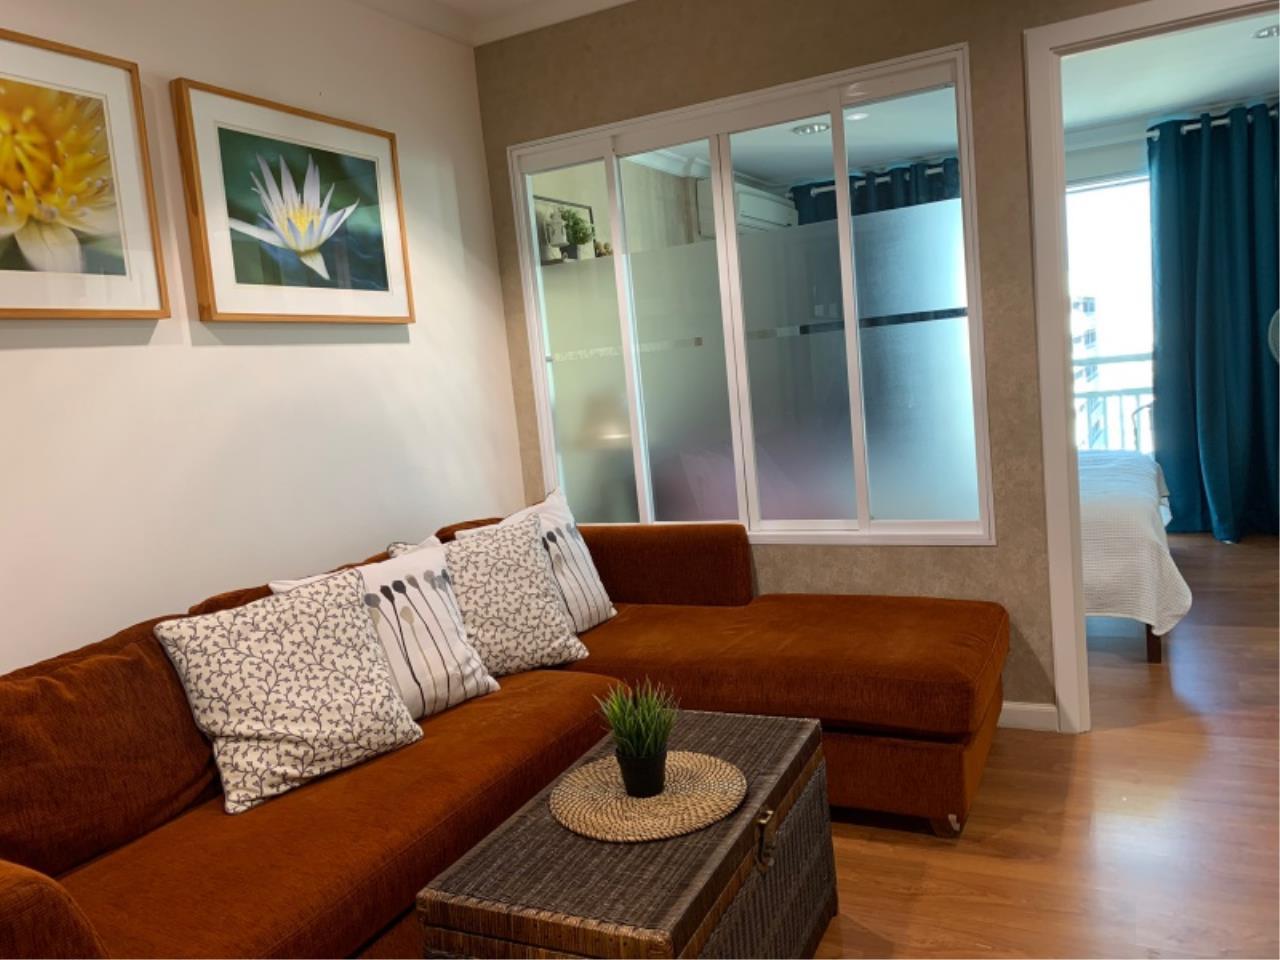 Century21 Skylux Agency's Grand Park View / Condo For Rent / 1 Bedroom / 35 SQM / MRT Blue Line / Bangkok 10